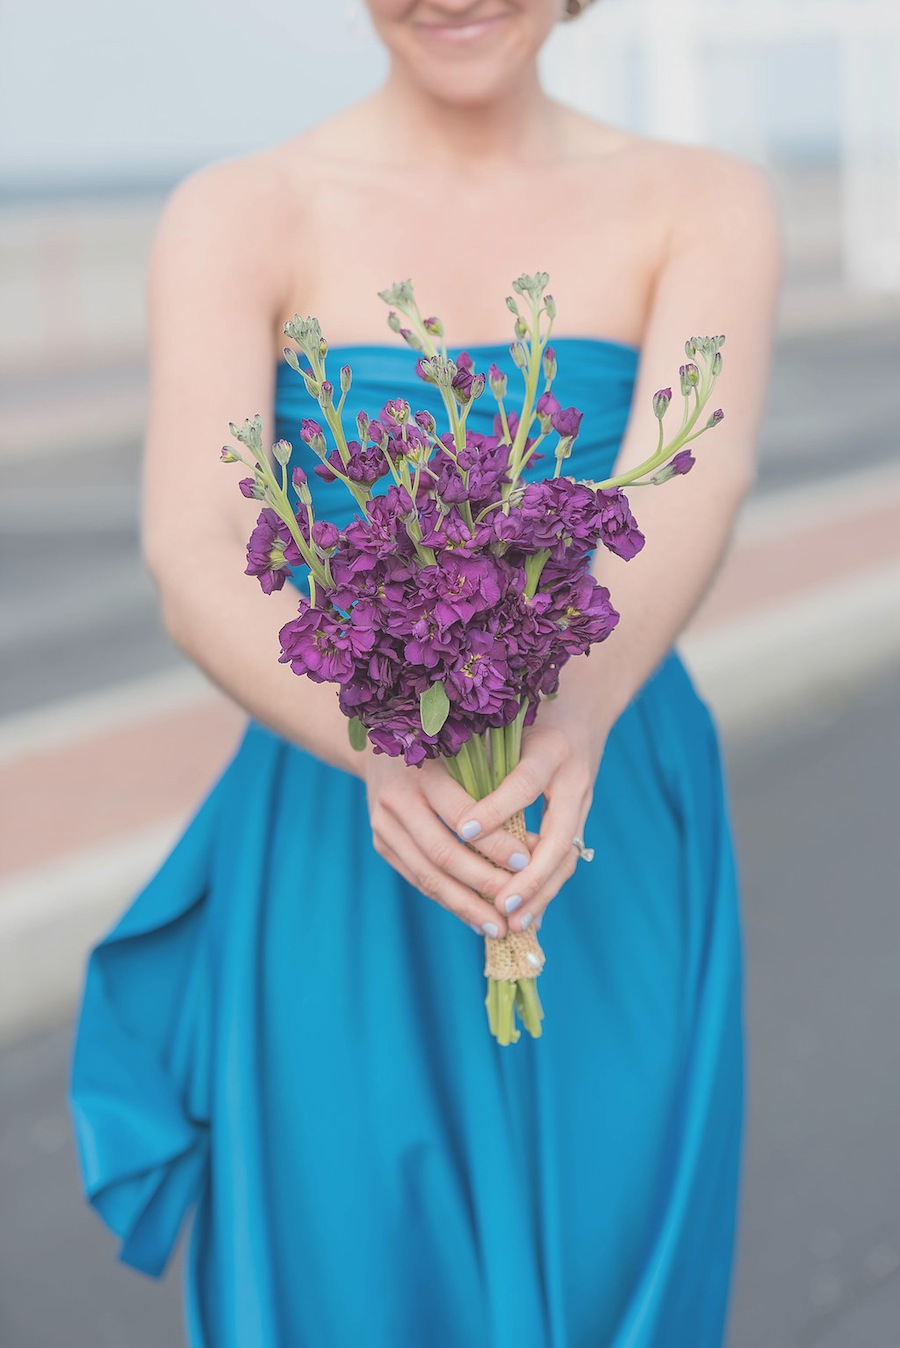 Purple Wedding Bouquet & Blue Bridesmaid Dress